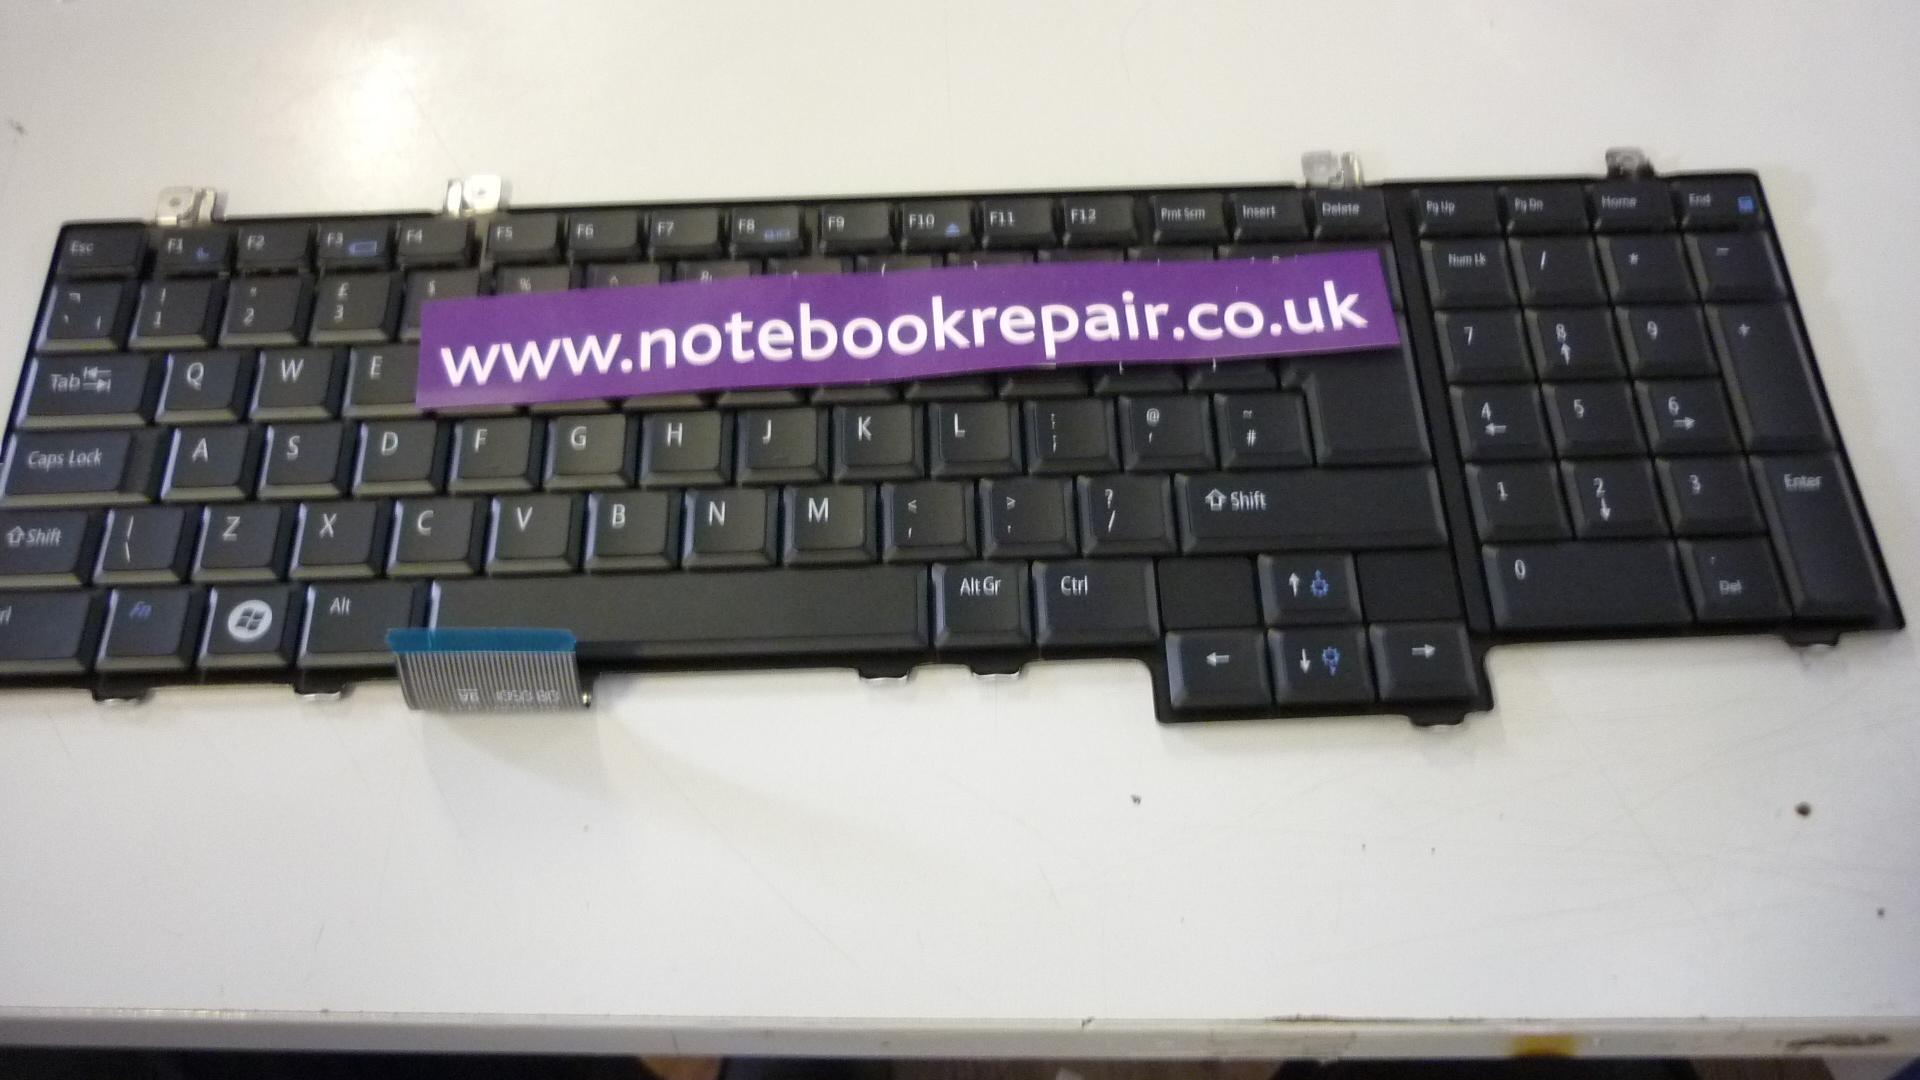 5, RK695, Studio 1735 / 6 / 7 uk keyboard